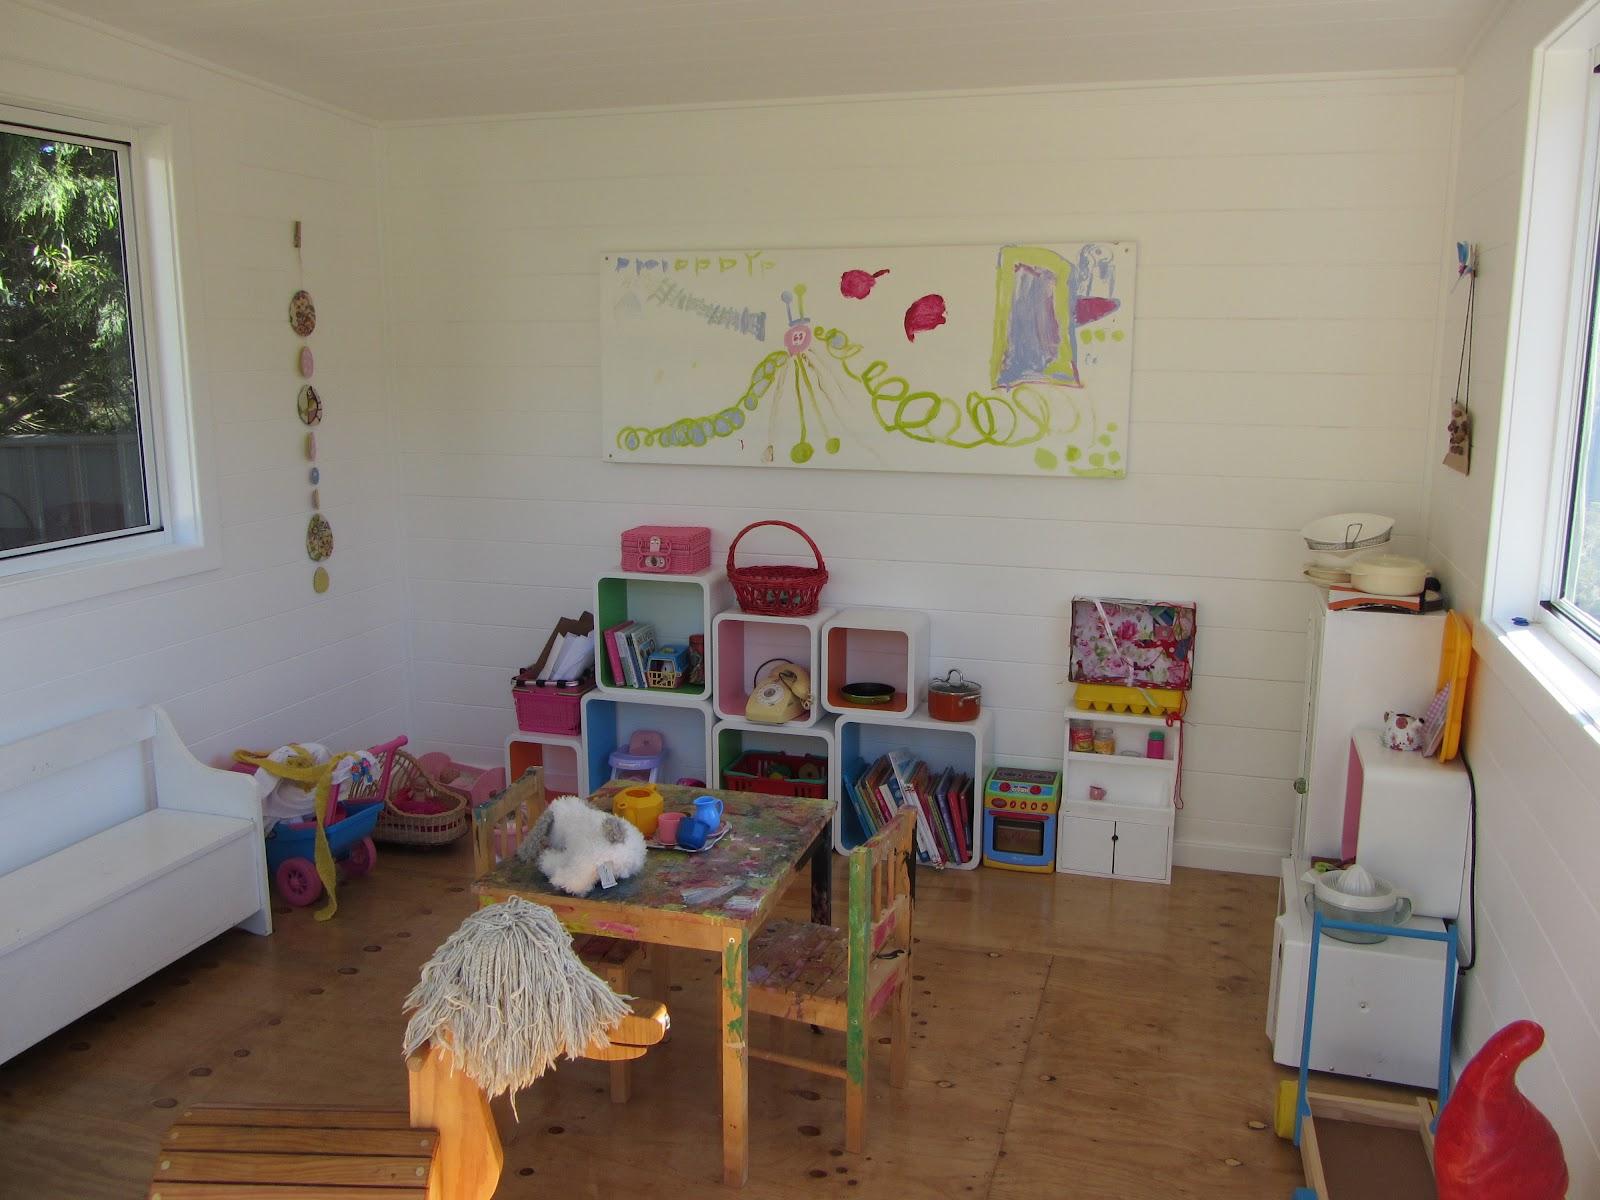 Thom Haus Handmade Cubby House For Children